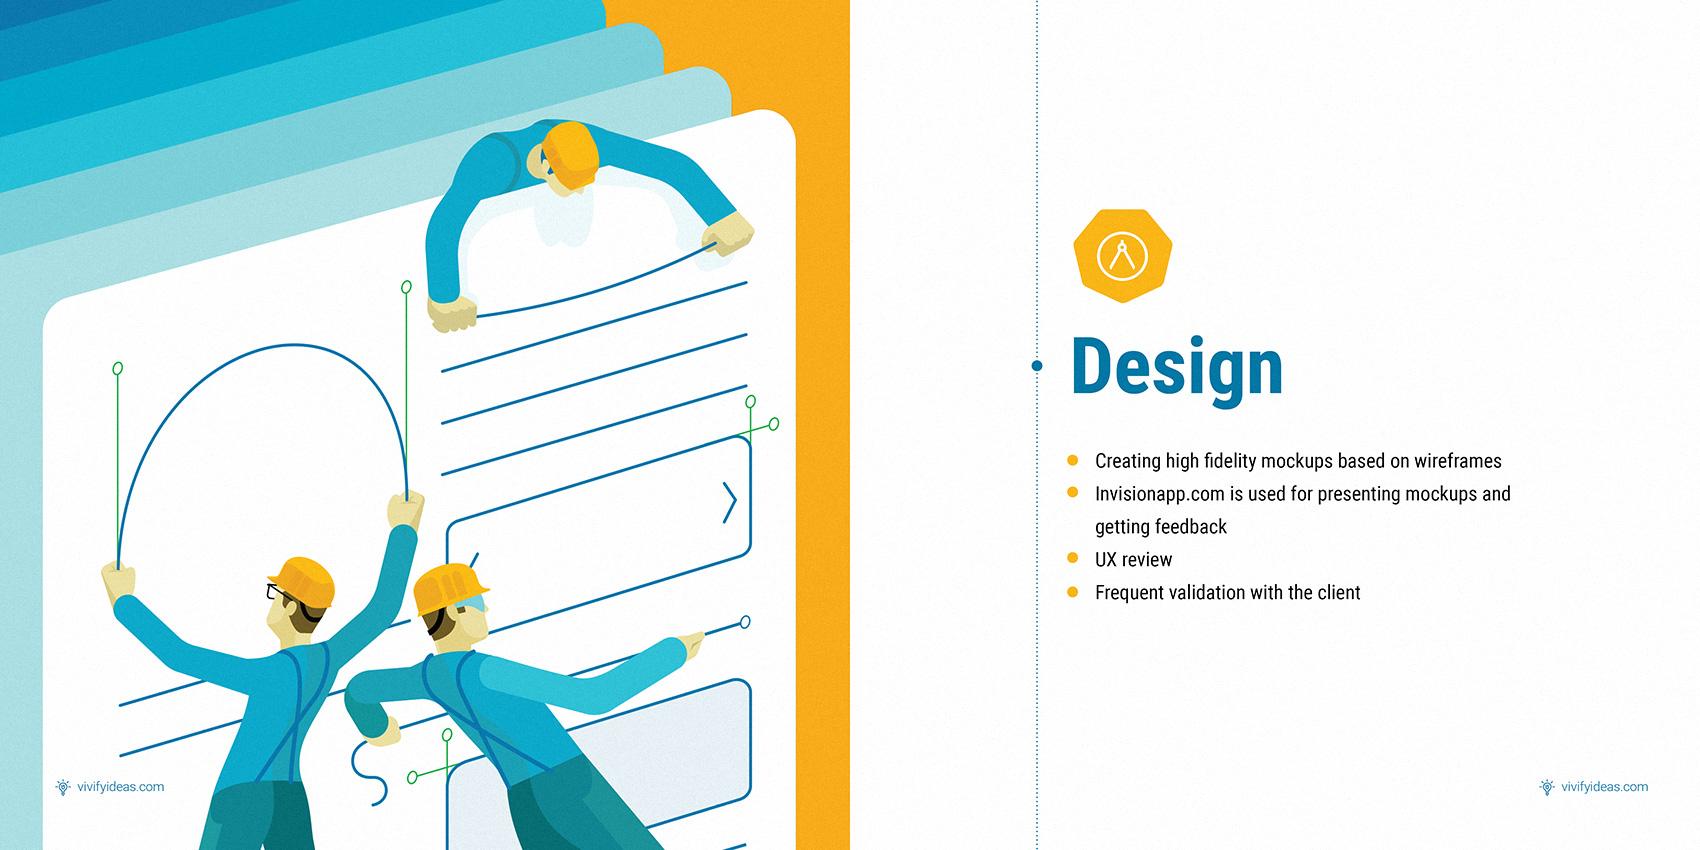 Project-Development-Lifecycle Design.jpg